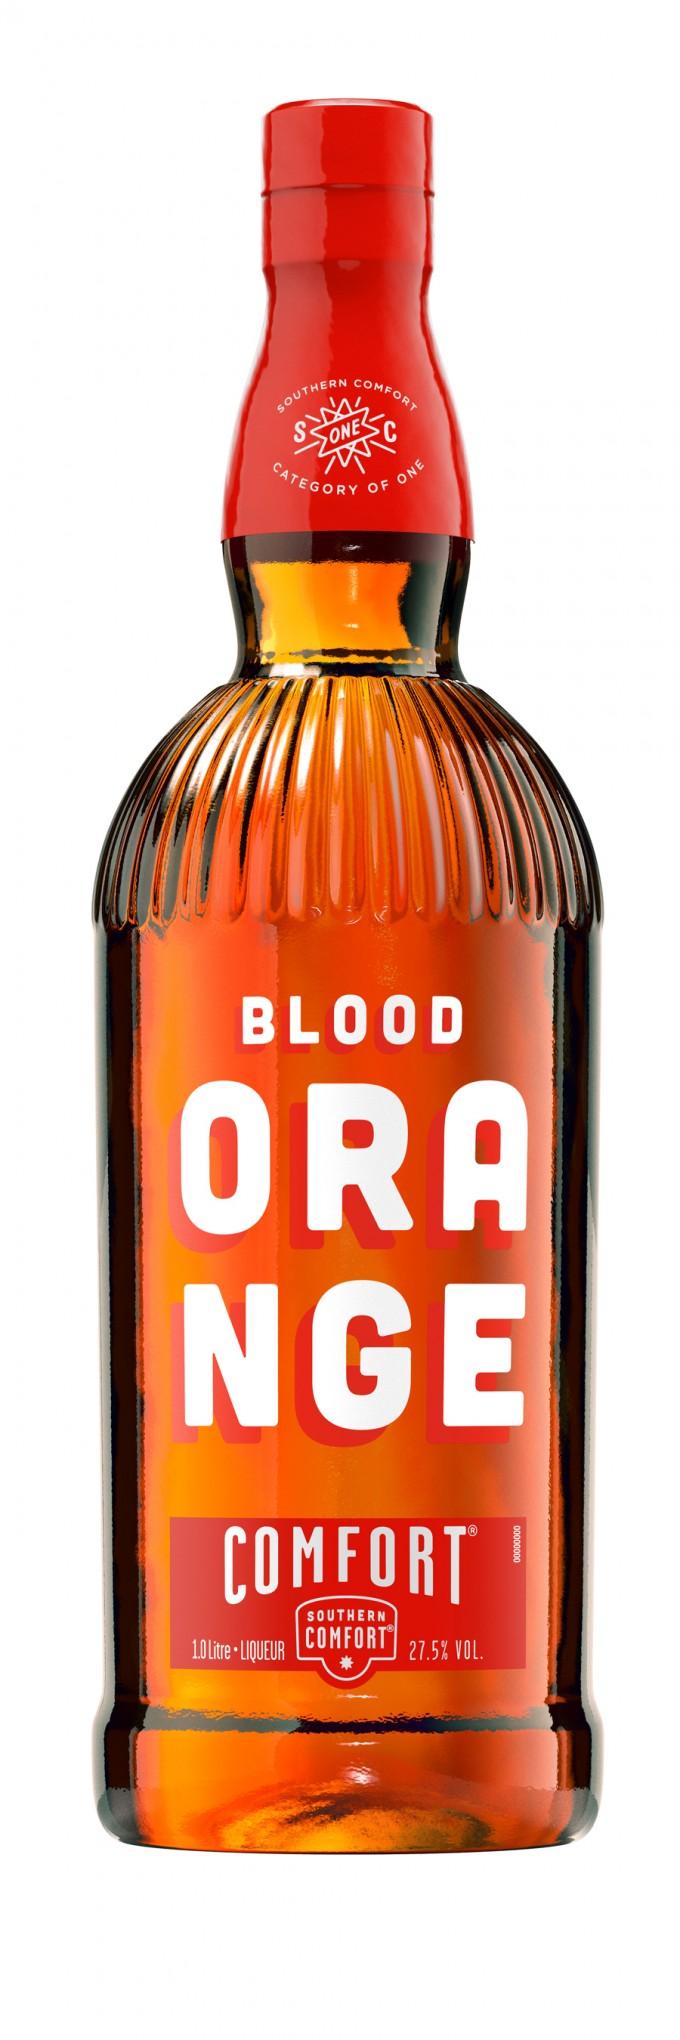 Southern Comfort joins Blood Orange trend